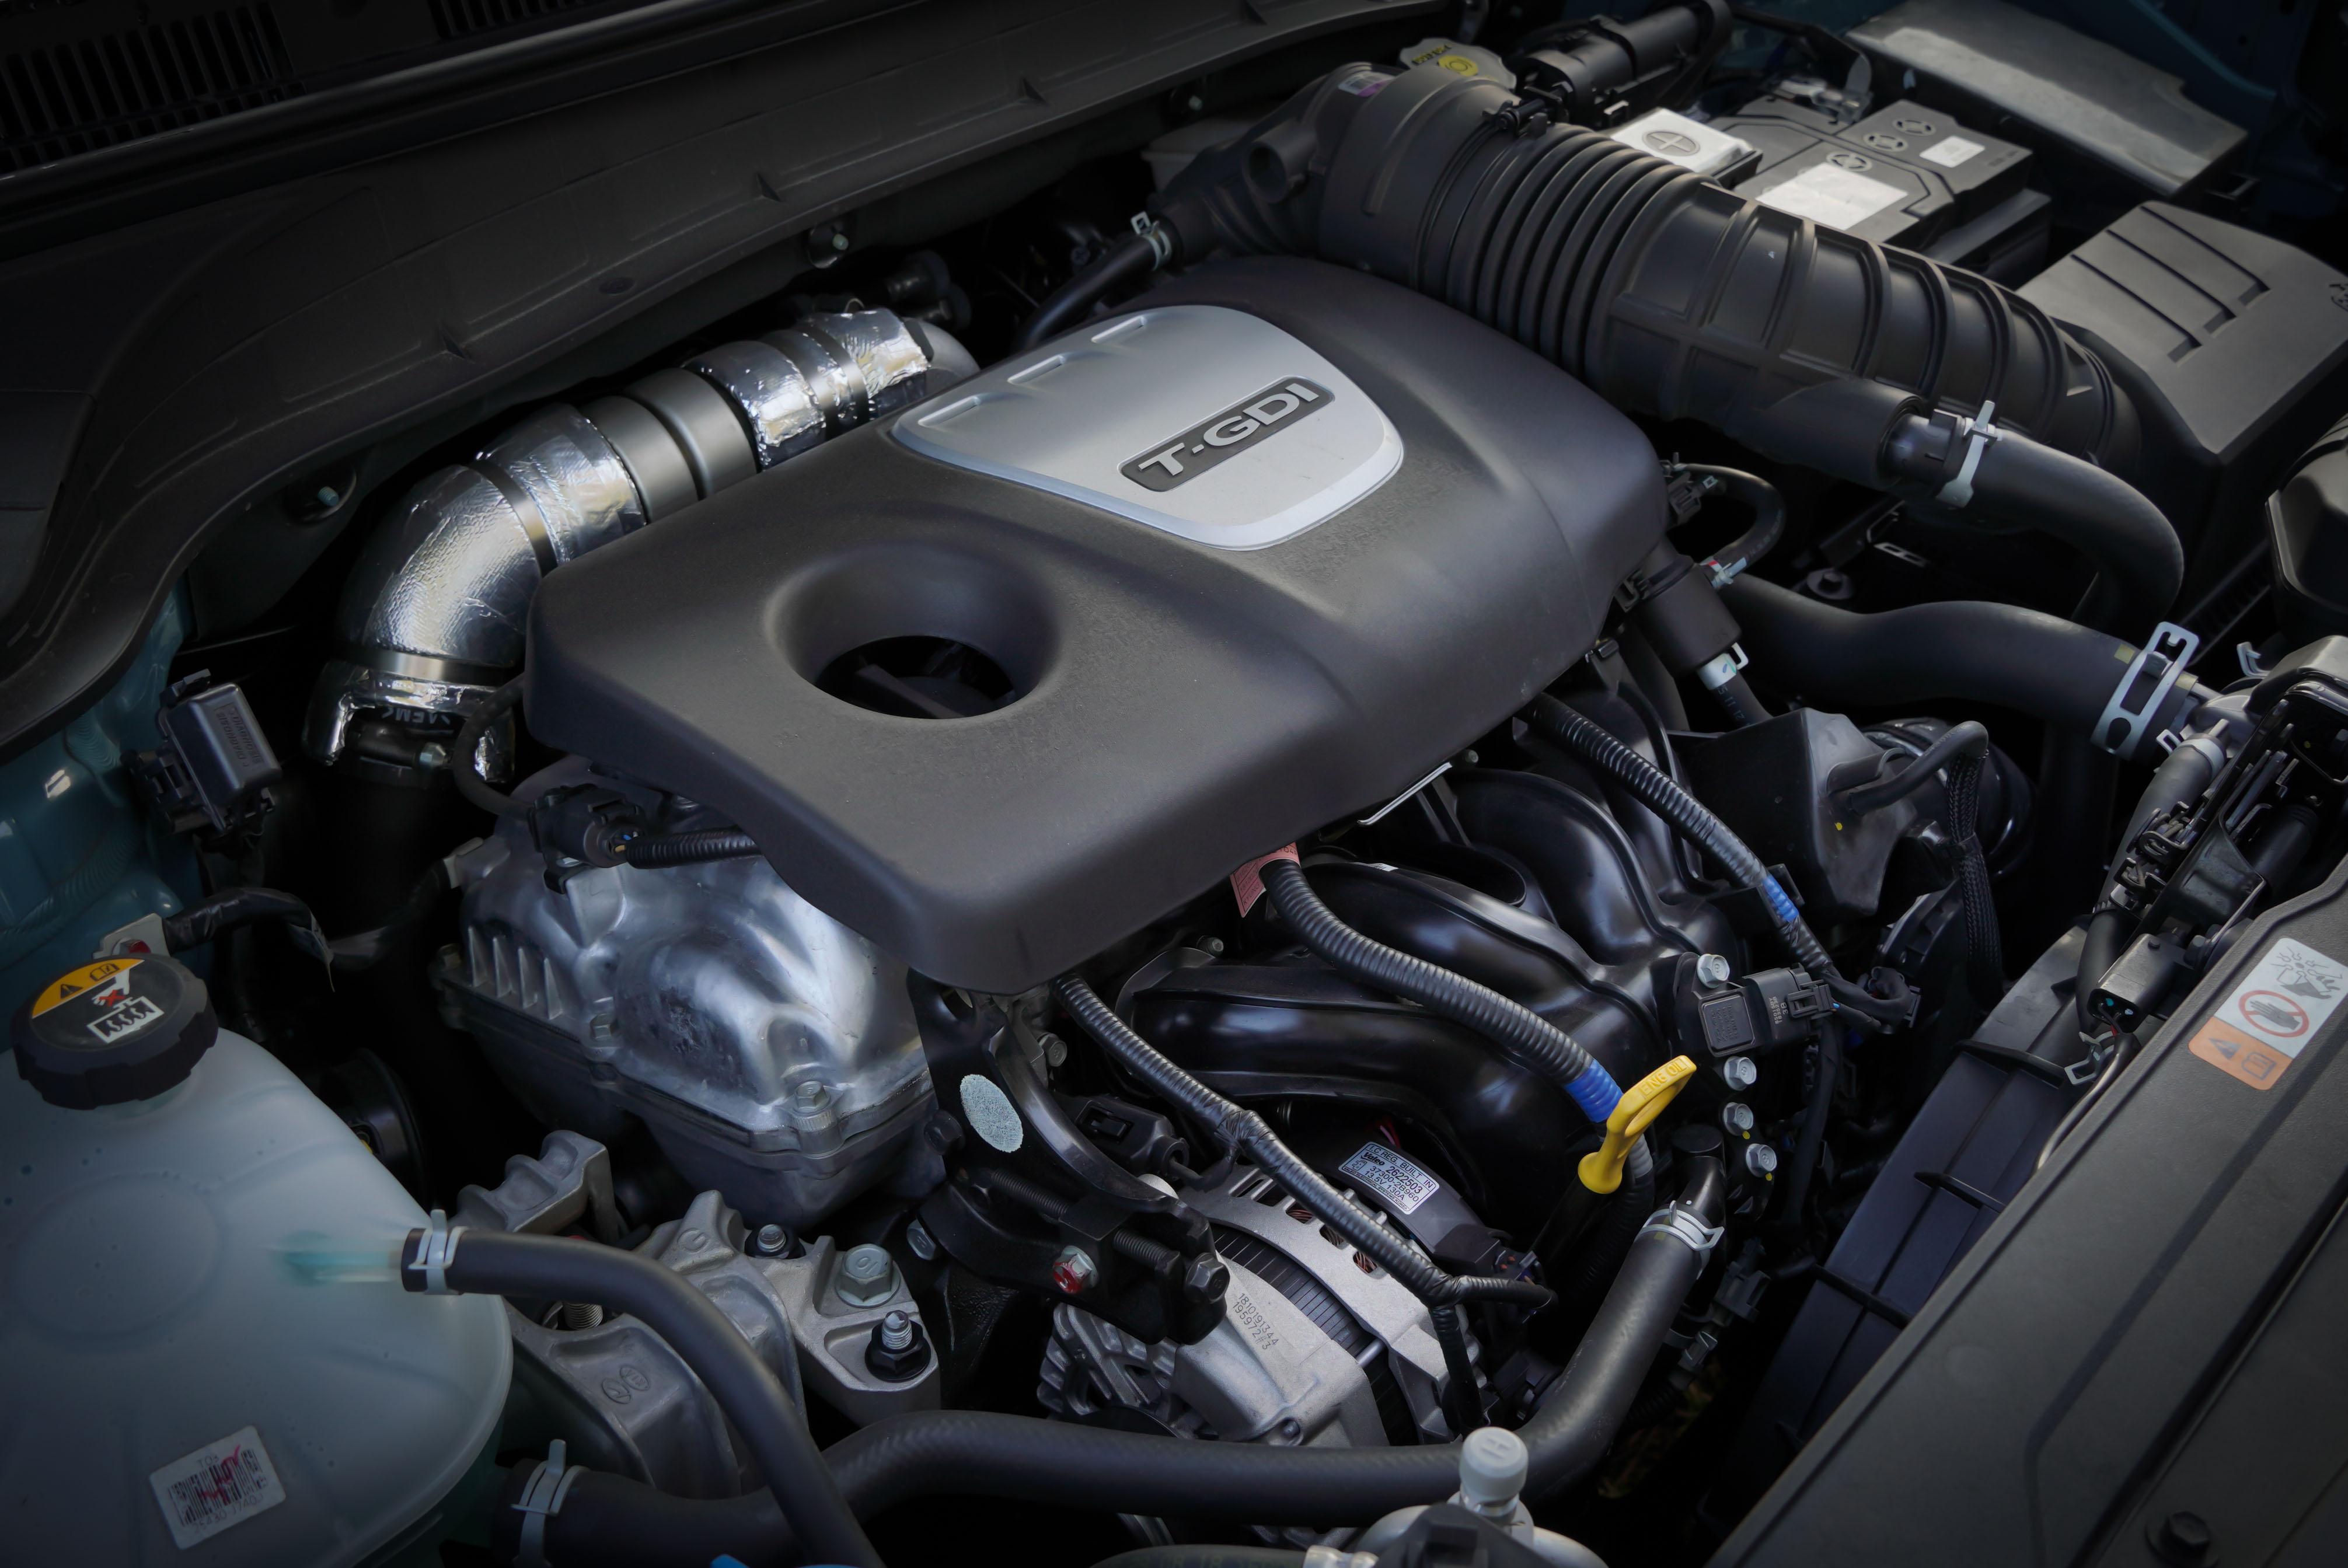 Kona 全車系 1.6 升直列四缸 GDi 缸內直噴渦輪增壓引擎,擁有 177 hp@5,500 rpm / 27.0 kgm@1,500~4,500 rpm 的出眾性能。